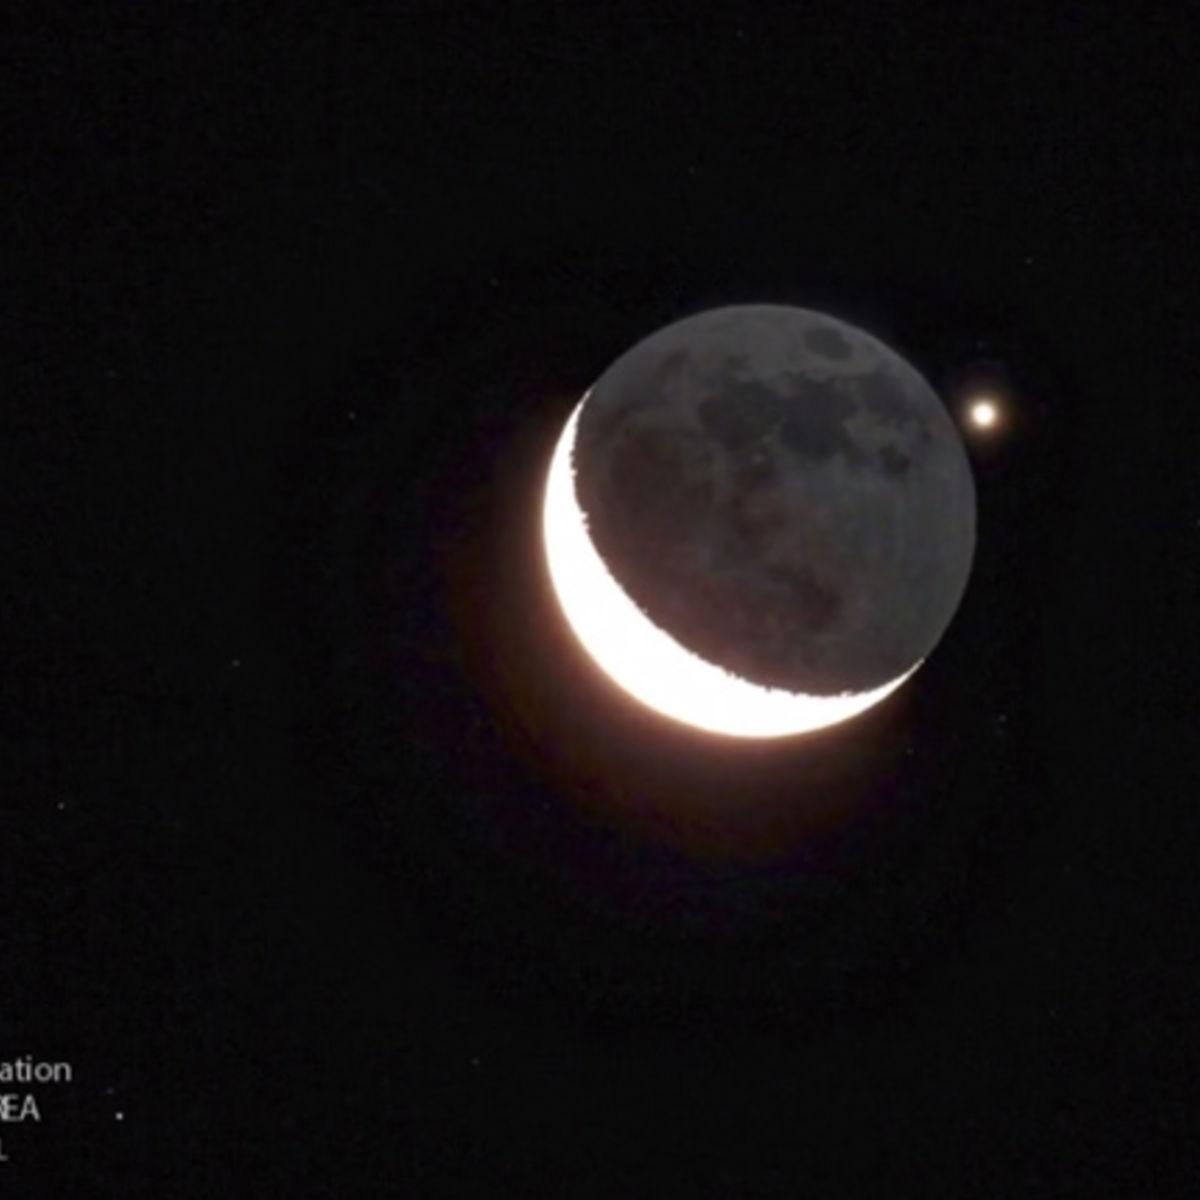 moon_venus_occultation2012.jpg